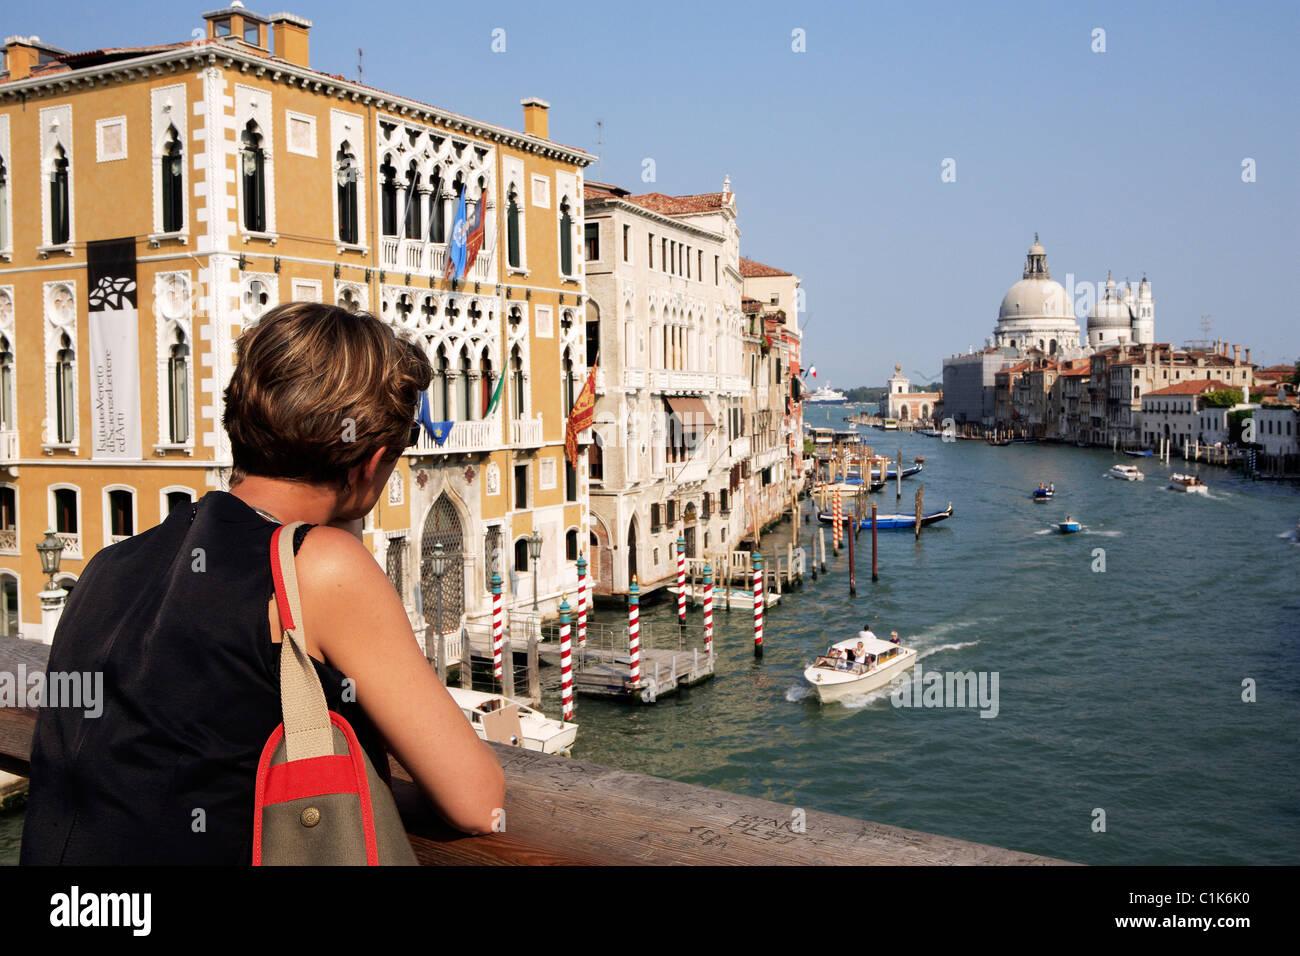 Italy, Veneto, Venice, the Grand Canal view from Academia Bridge - Stock Image